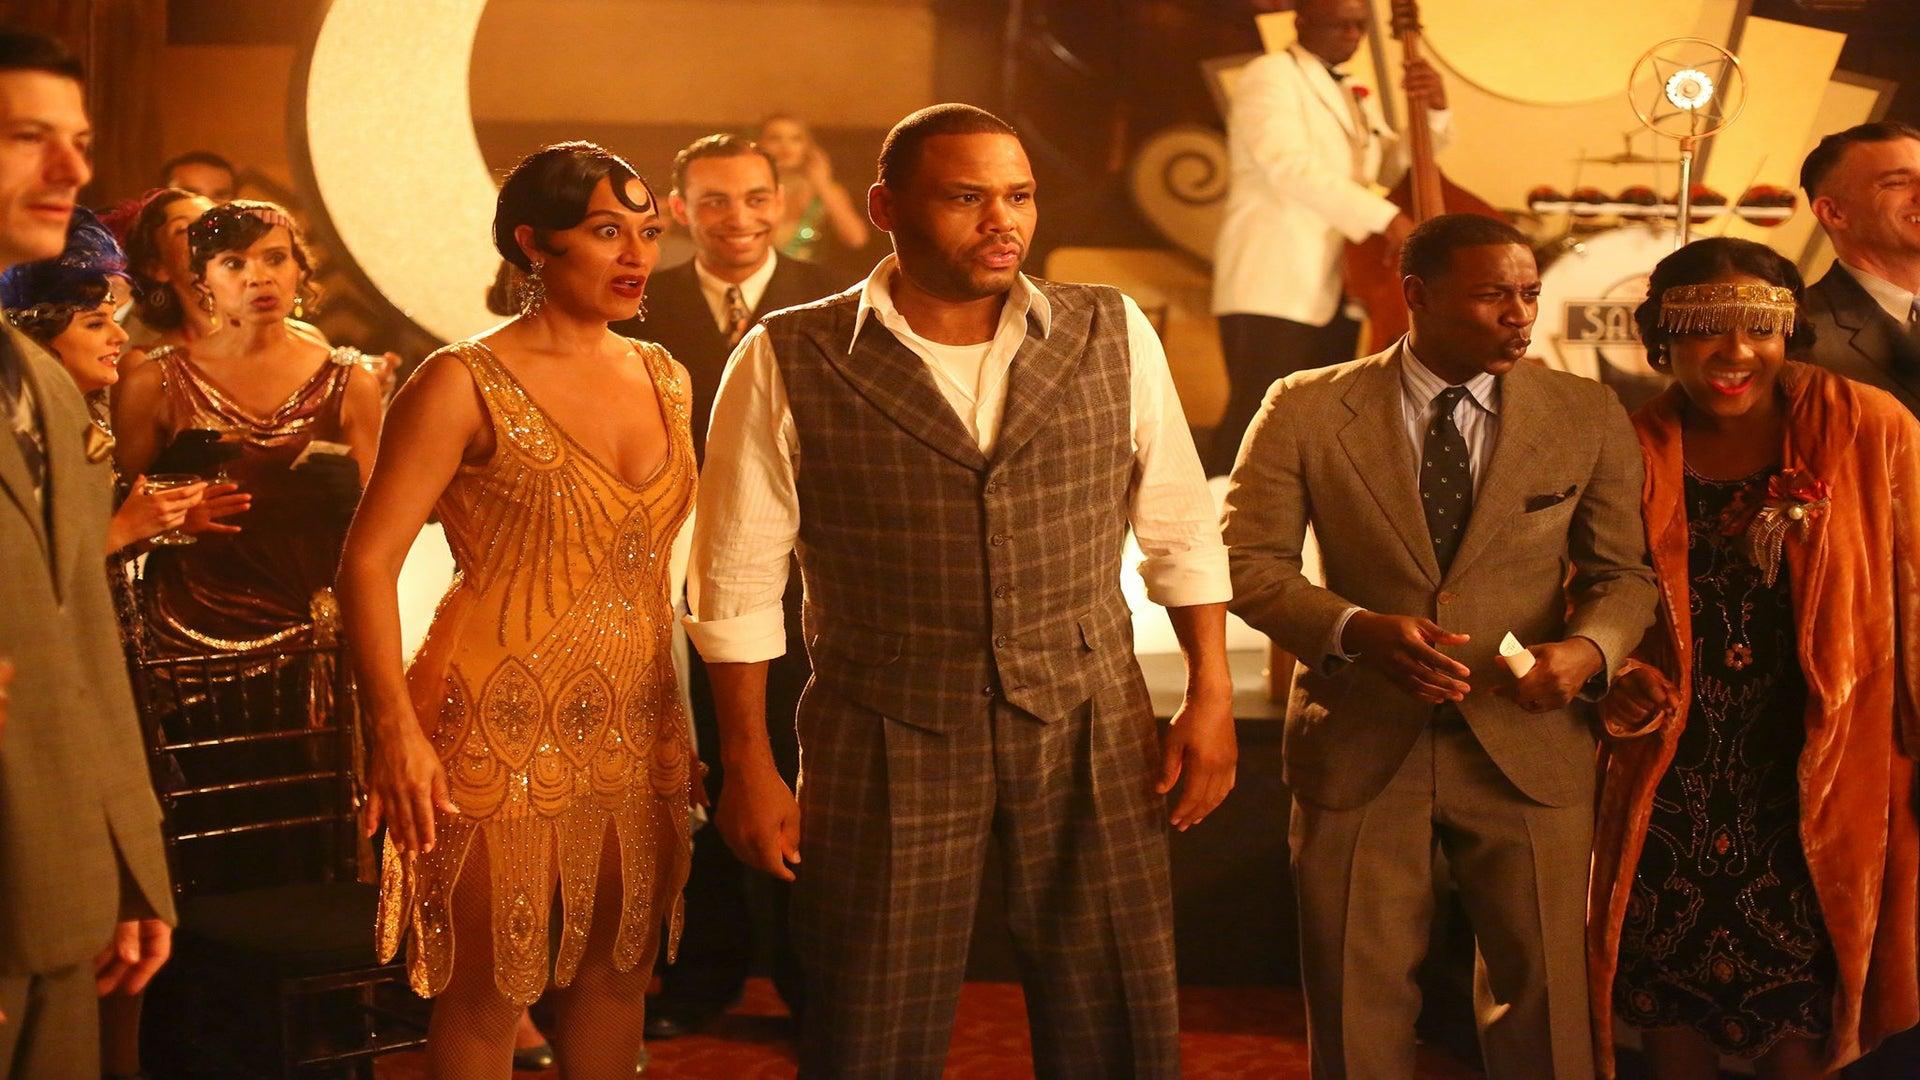 The 'Black-ish' Season 1 Finale Took Us Back to the Harlem Renaissance